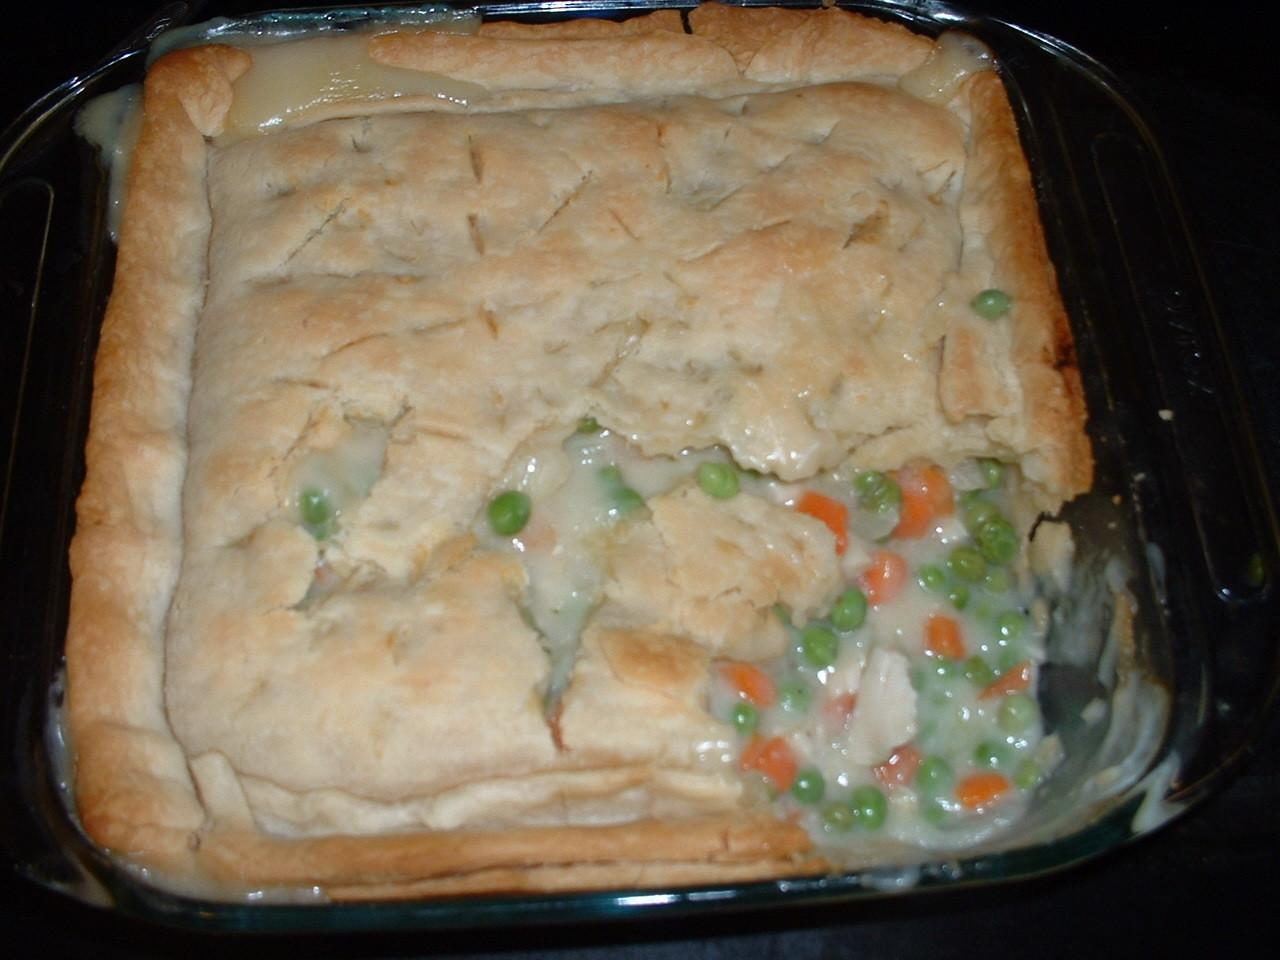 Home Made Chicken Pot Pie  Homemade Chicken Pot Pie Twin Cities Frugal Mom